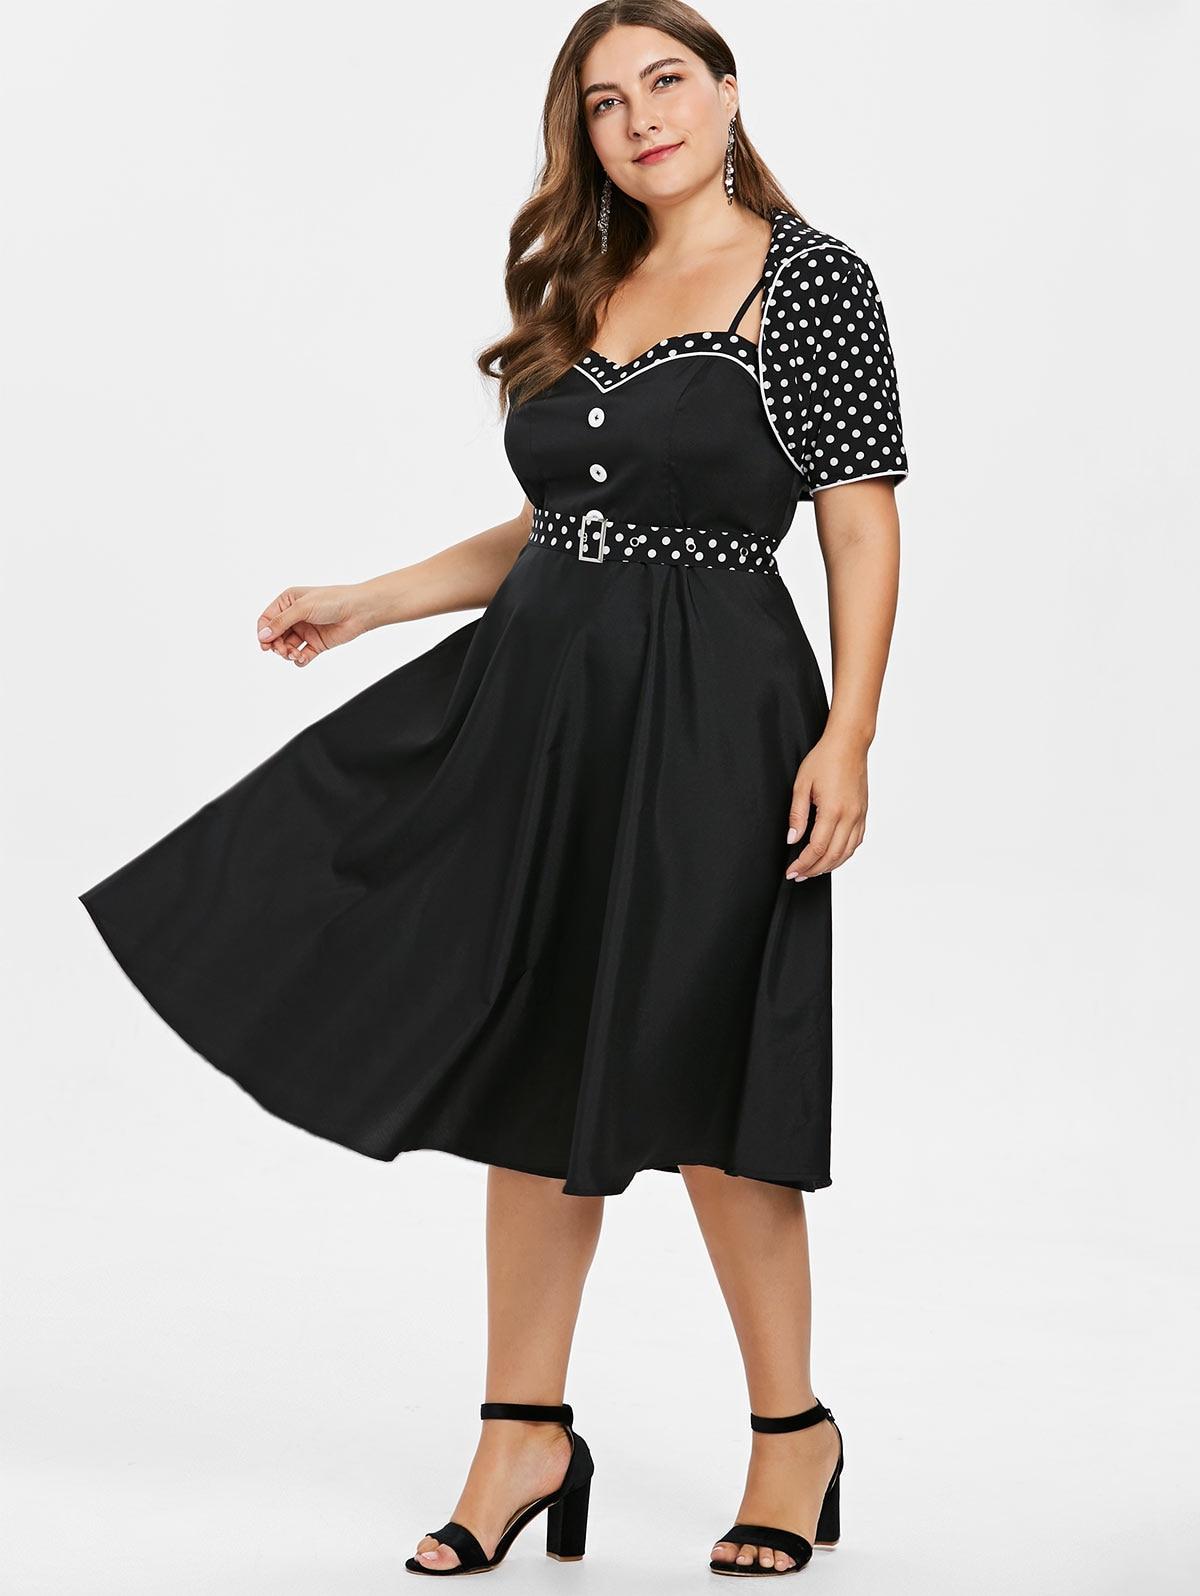 Wipalo Vintage Plus Size Polka Dot Vintage Dress With Belt Women Short  Sleeves Flared Retro Cape Spring Dress Vestidos Femme 5XL